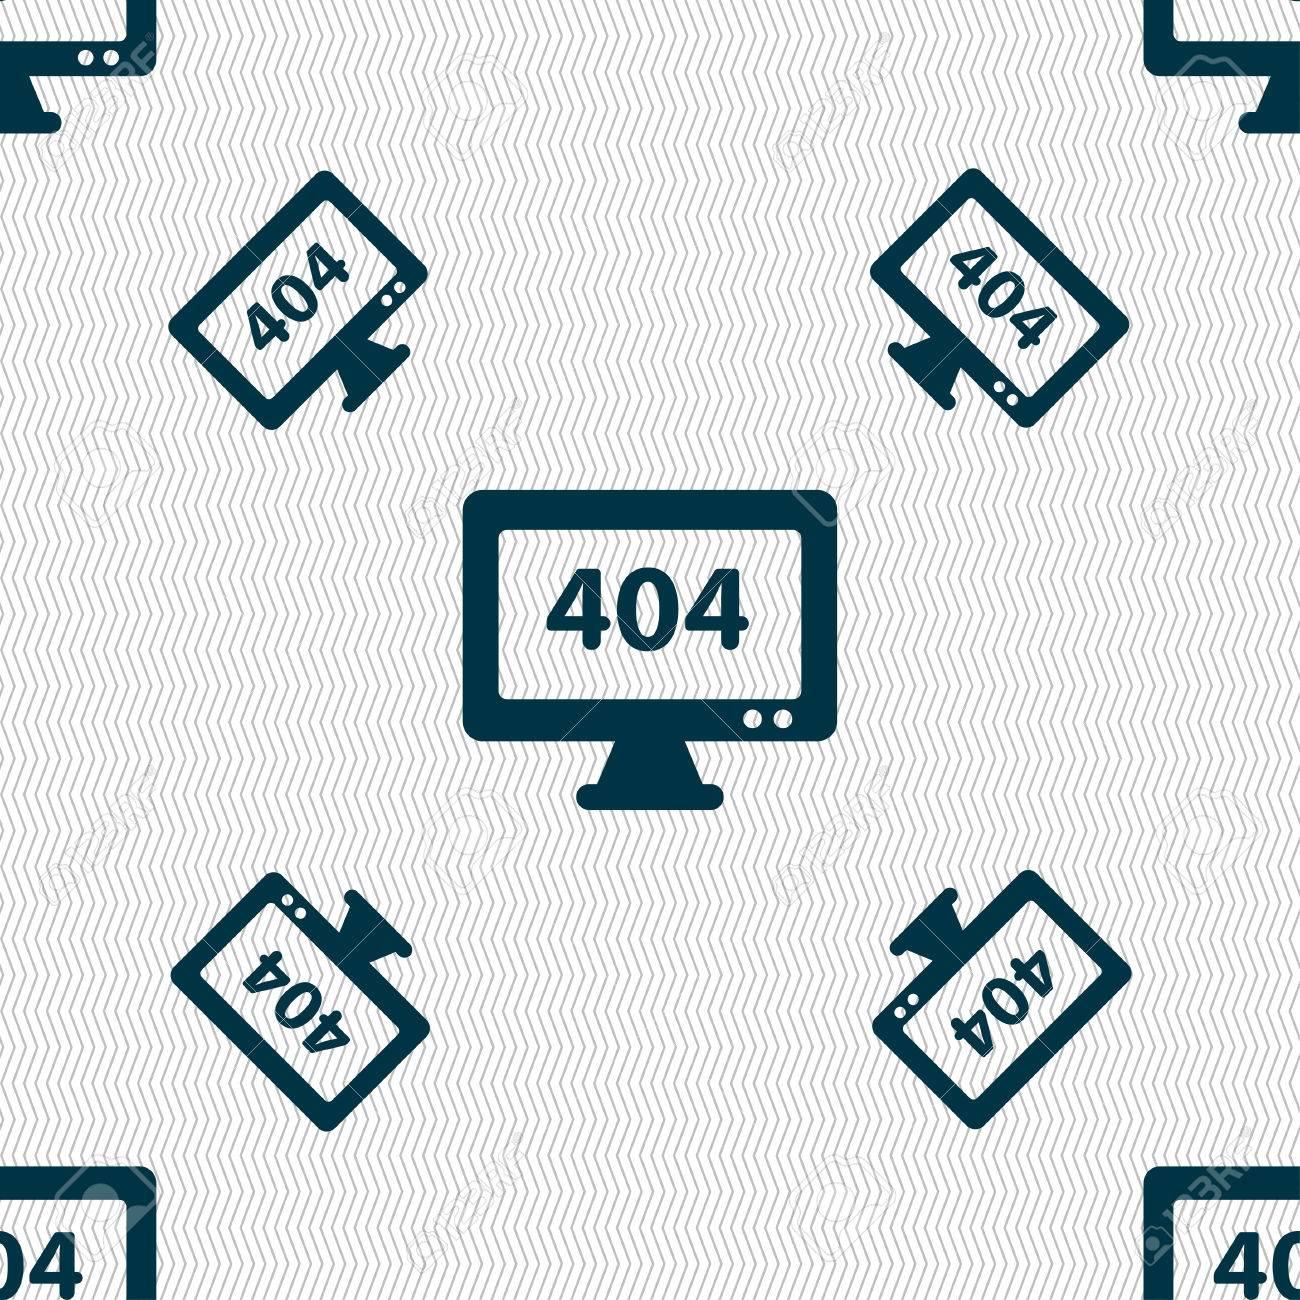 404 Not Found Erreur Icone Signe Seamless Texture Geometrique